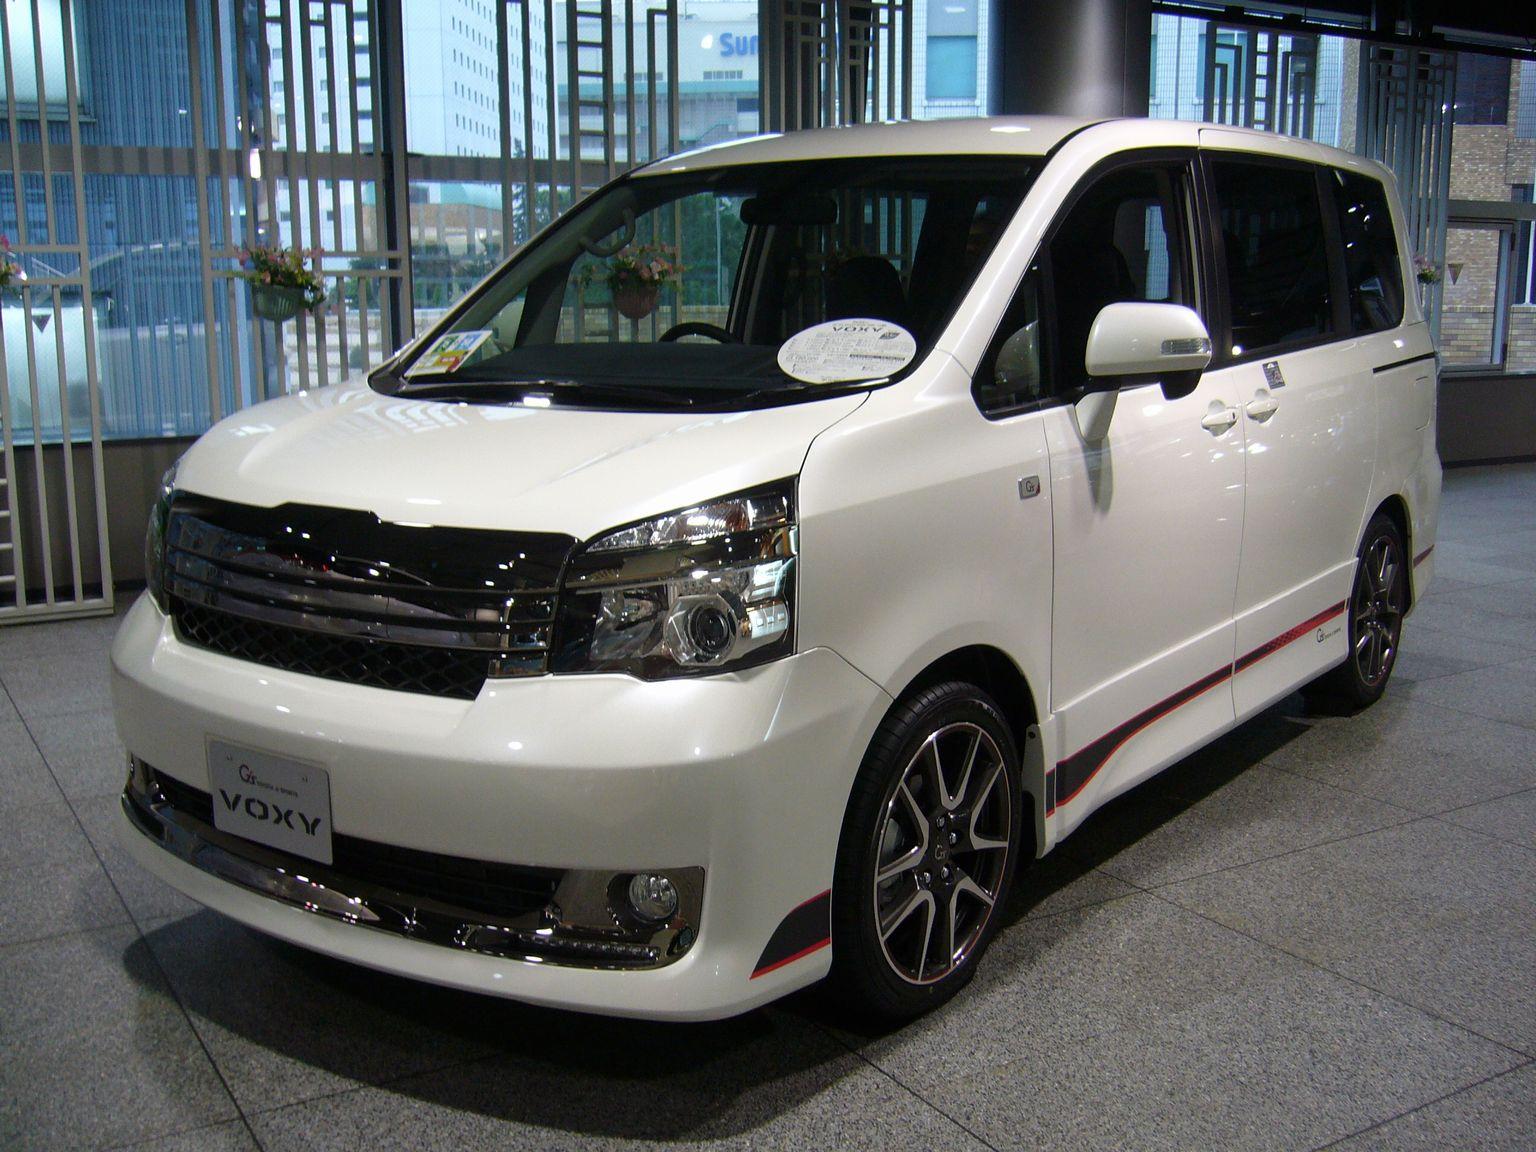 2014 Toyota Tacoma Price Toyota Voxy photos - PhotoGallery with 4 pics| CarsBase.com